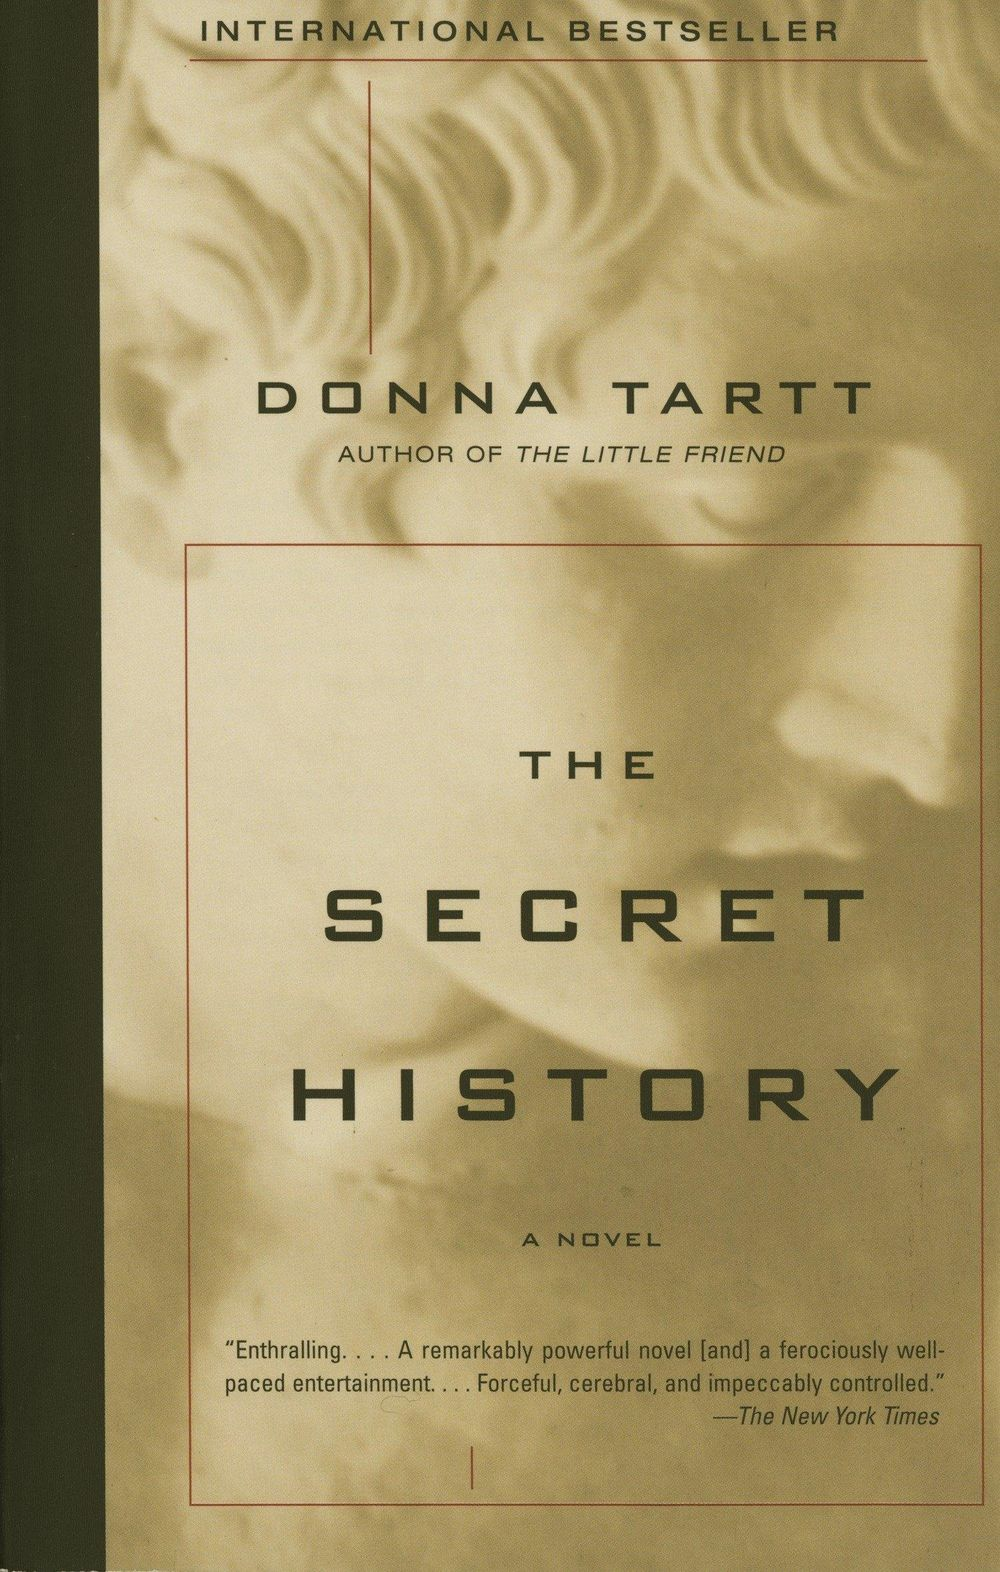 Donna Tartt - The secret history - image 1 - student project